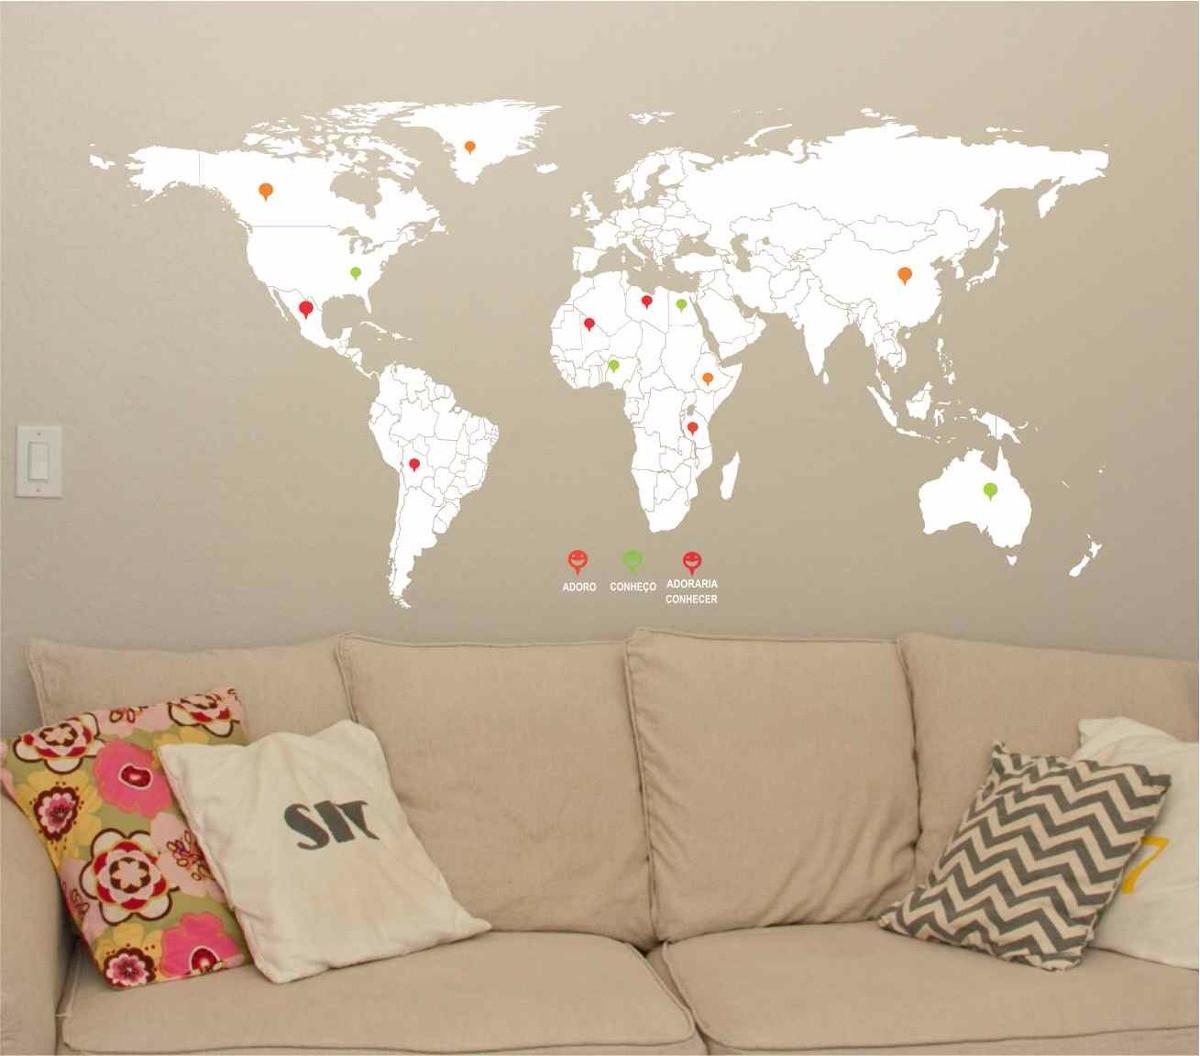 Adesivo Mapa Mundi Viagem Mochileiro Pins Marcacao No Elo7